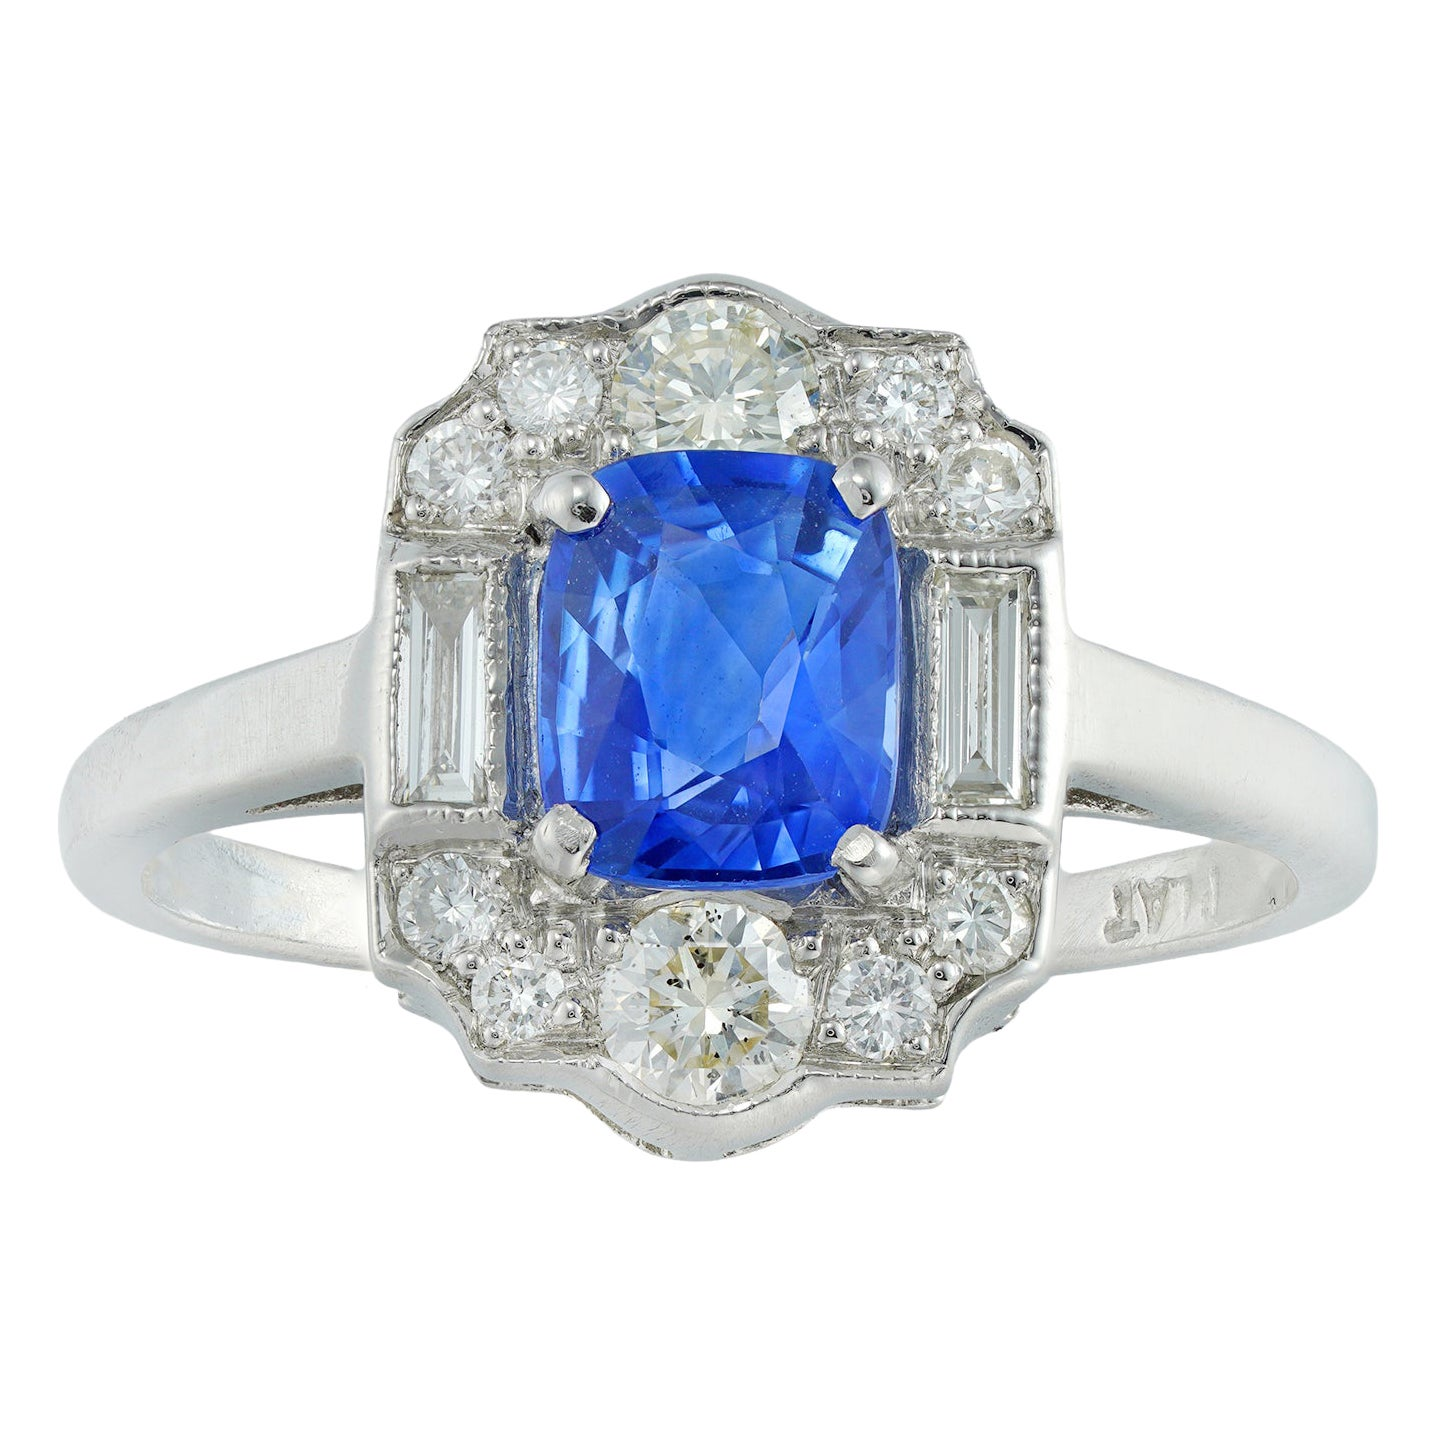 Art Deco Style Sapphire and Diamond Plaque Ring